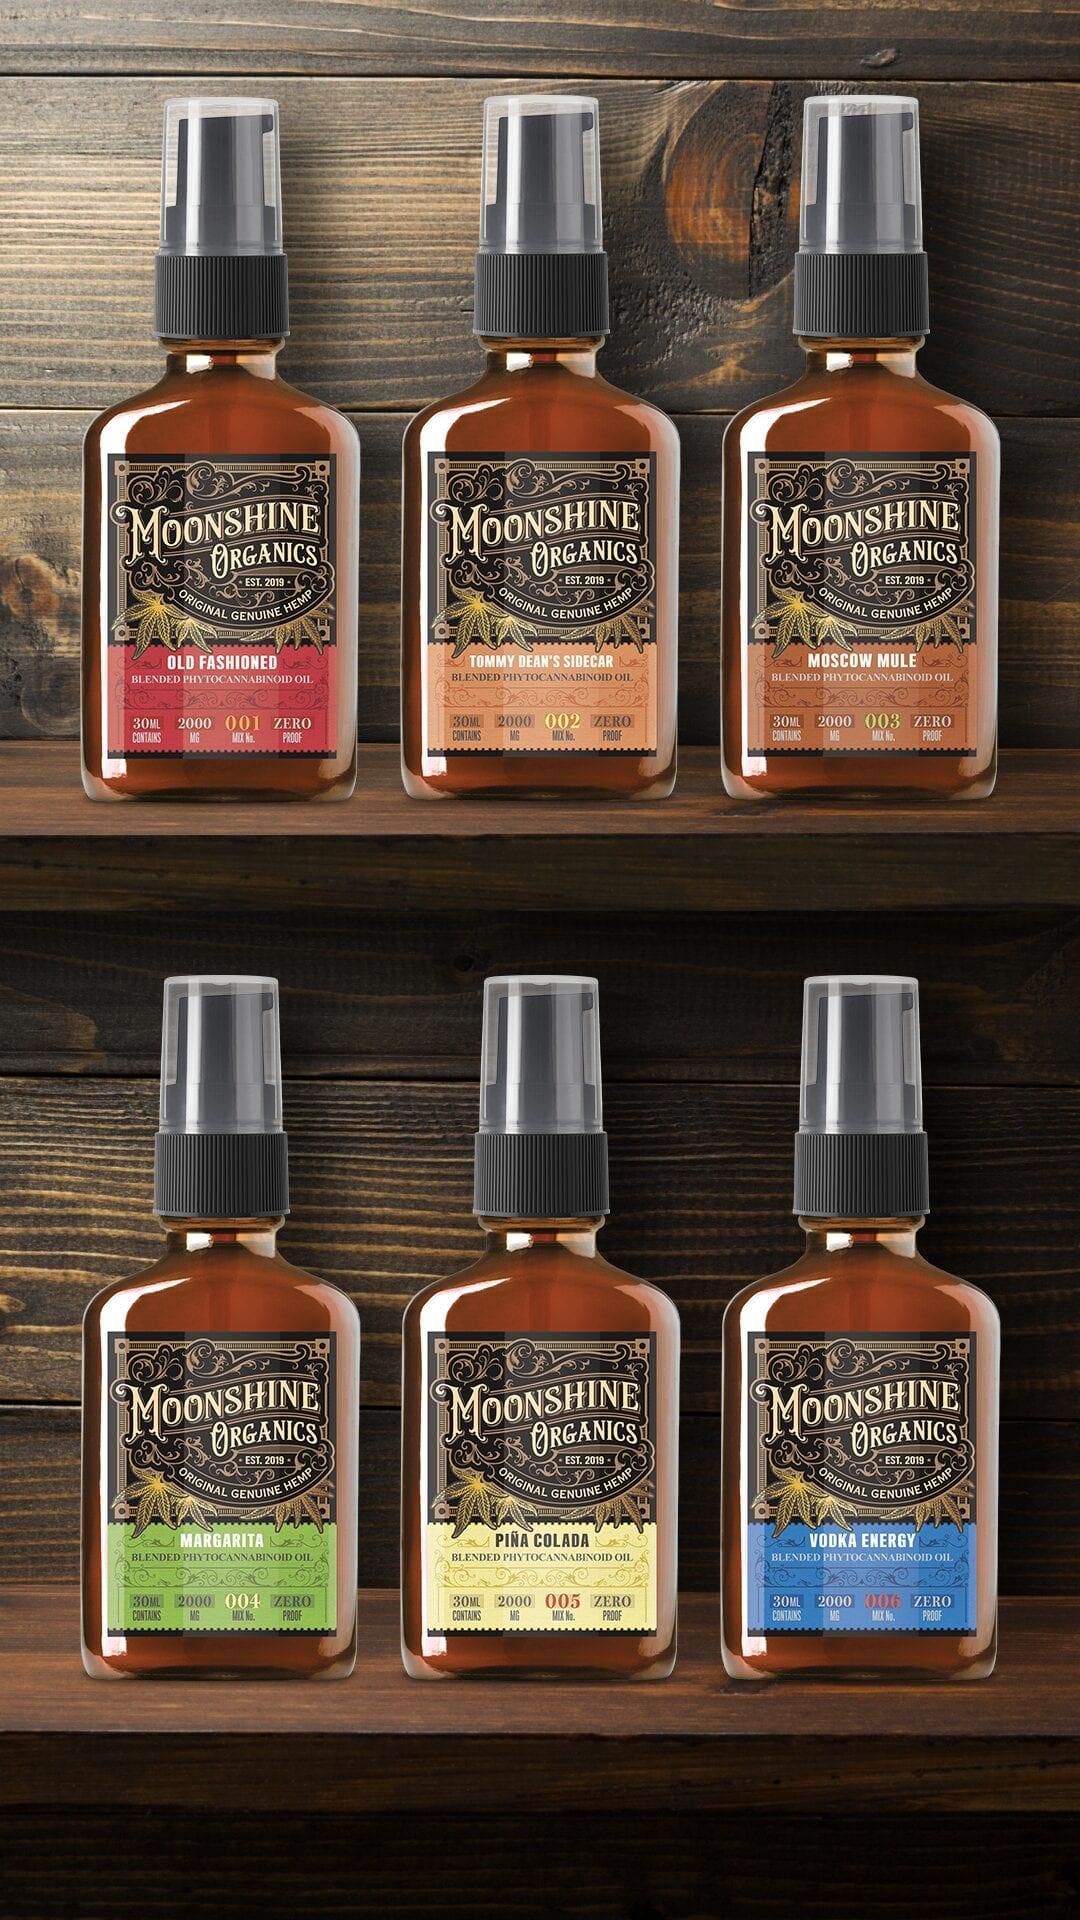 Moonshine Organics Mobile Home 1080x1920_v2